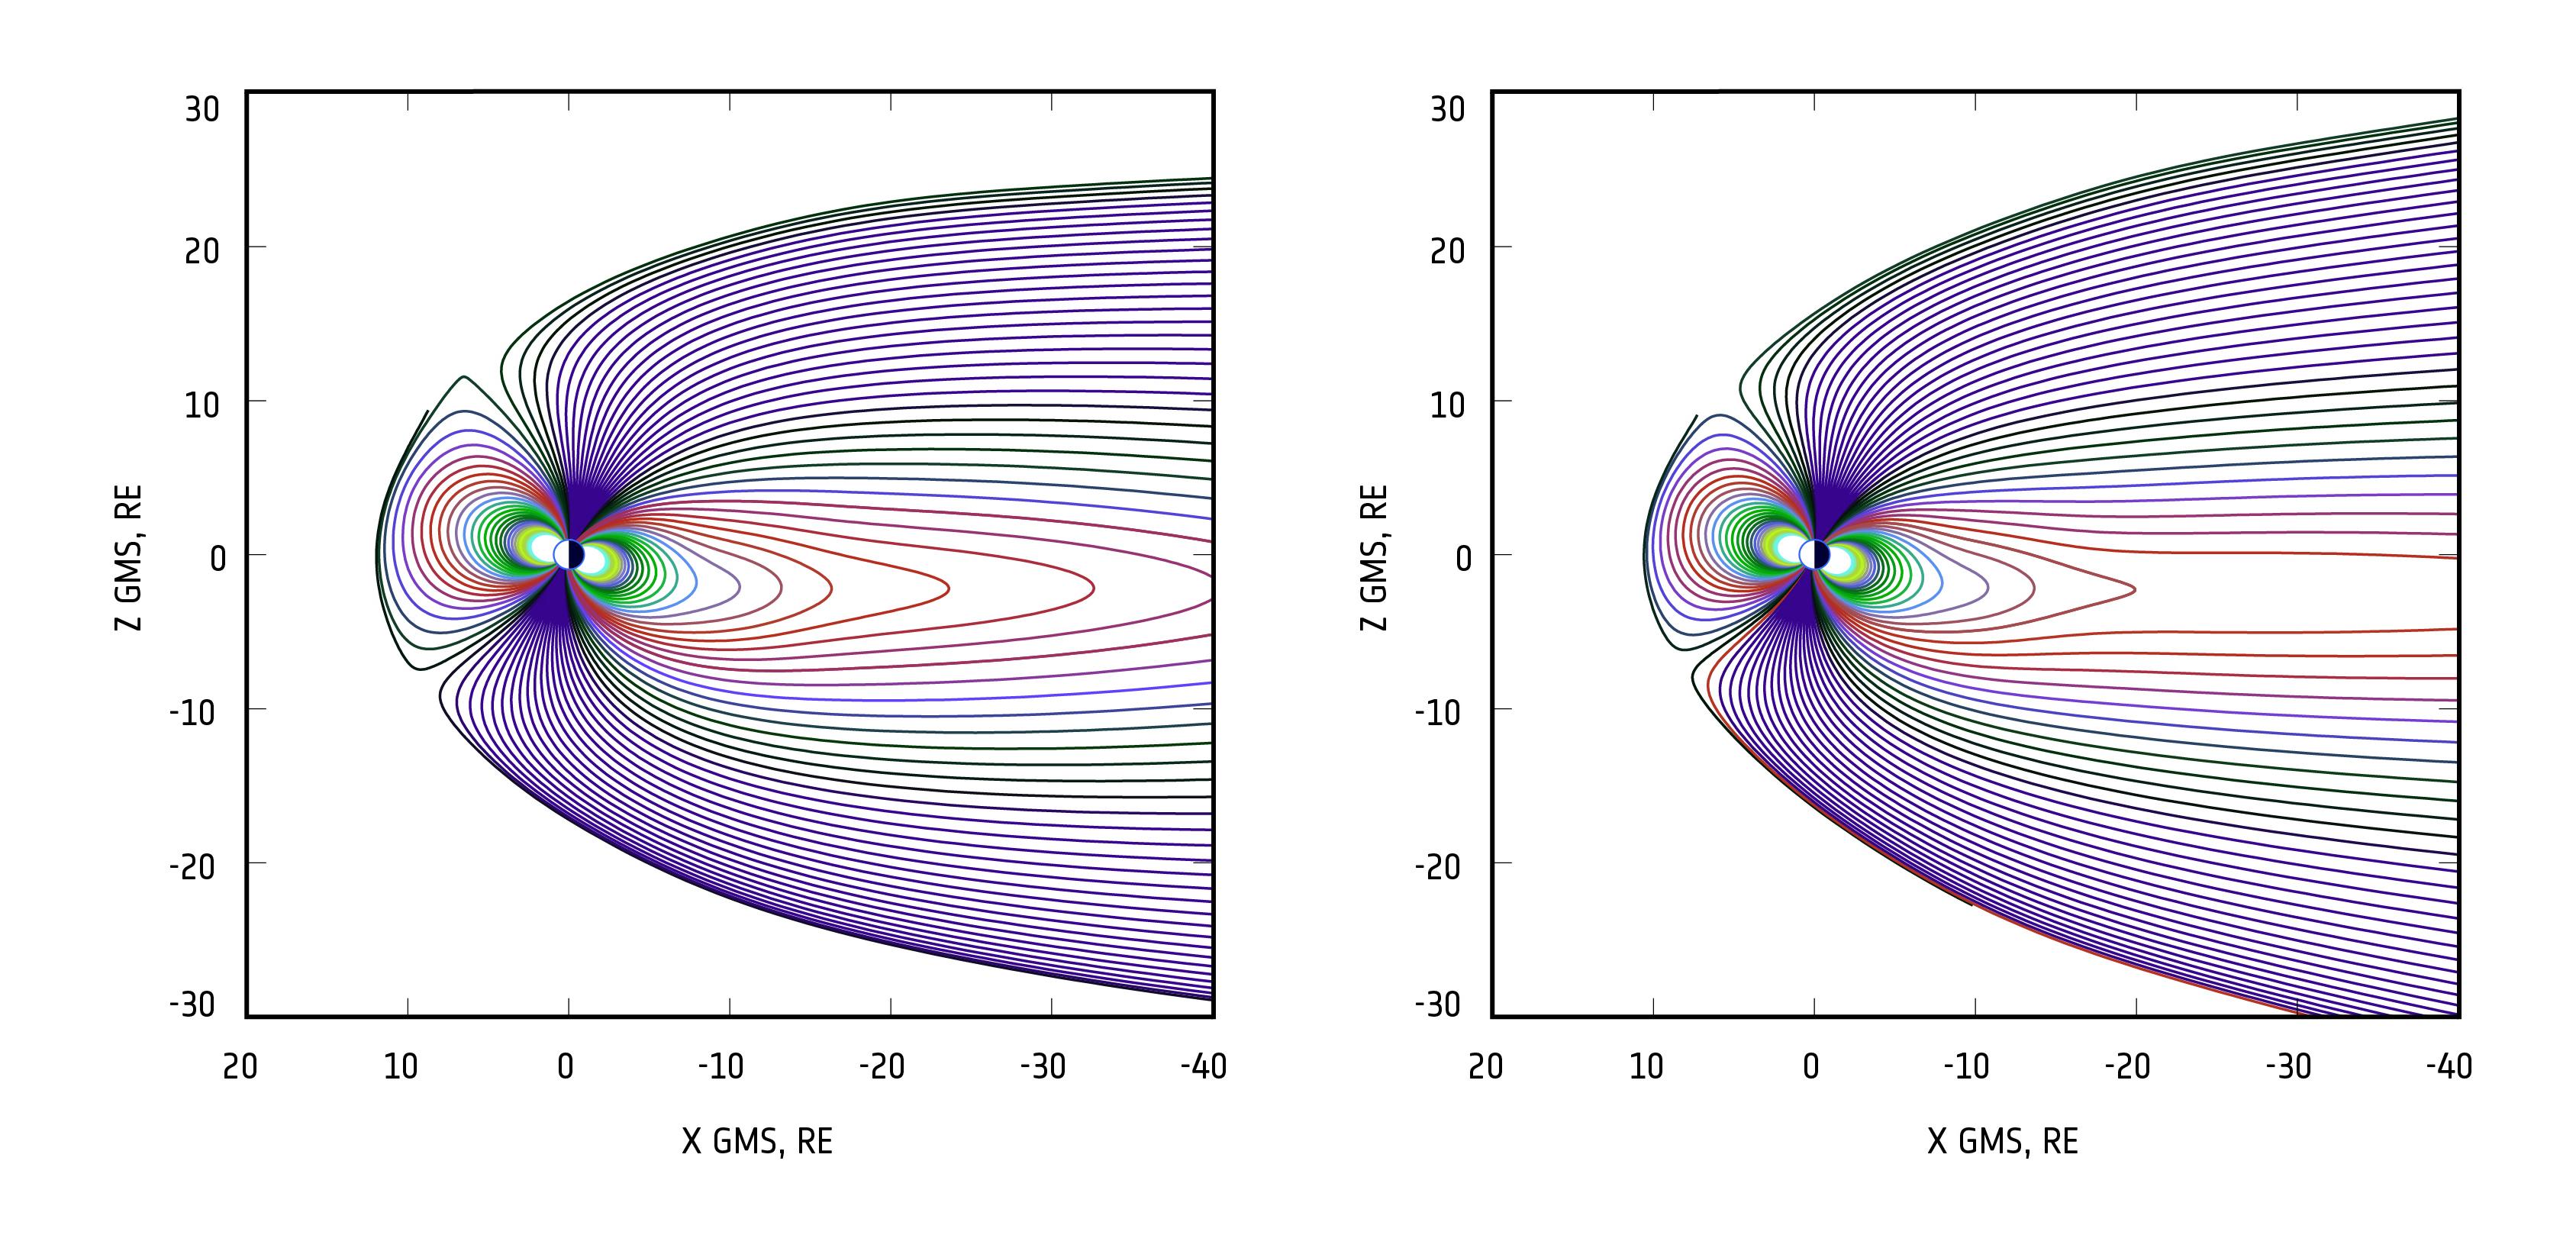 1567216414008-Cluster_Model_magnetosphere_field_plots.jpg